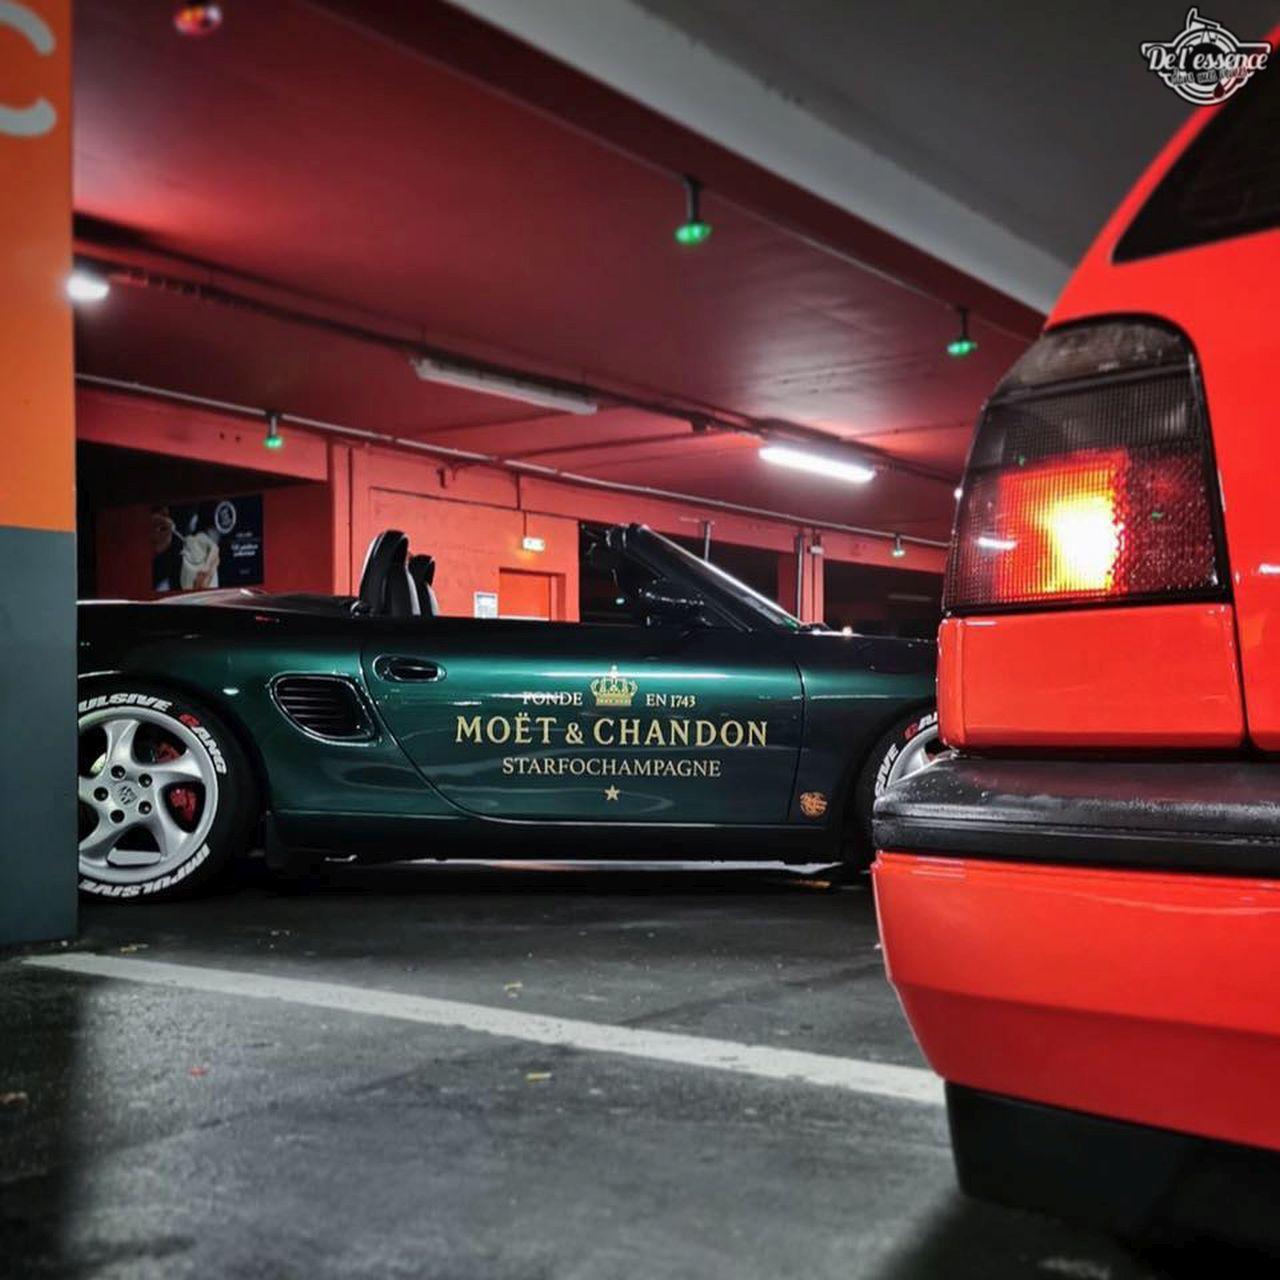 La Porsche Boxster S de Guillaume - Champagne Shower ! 1